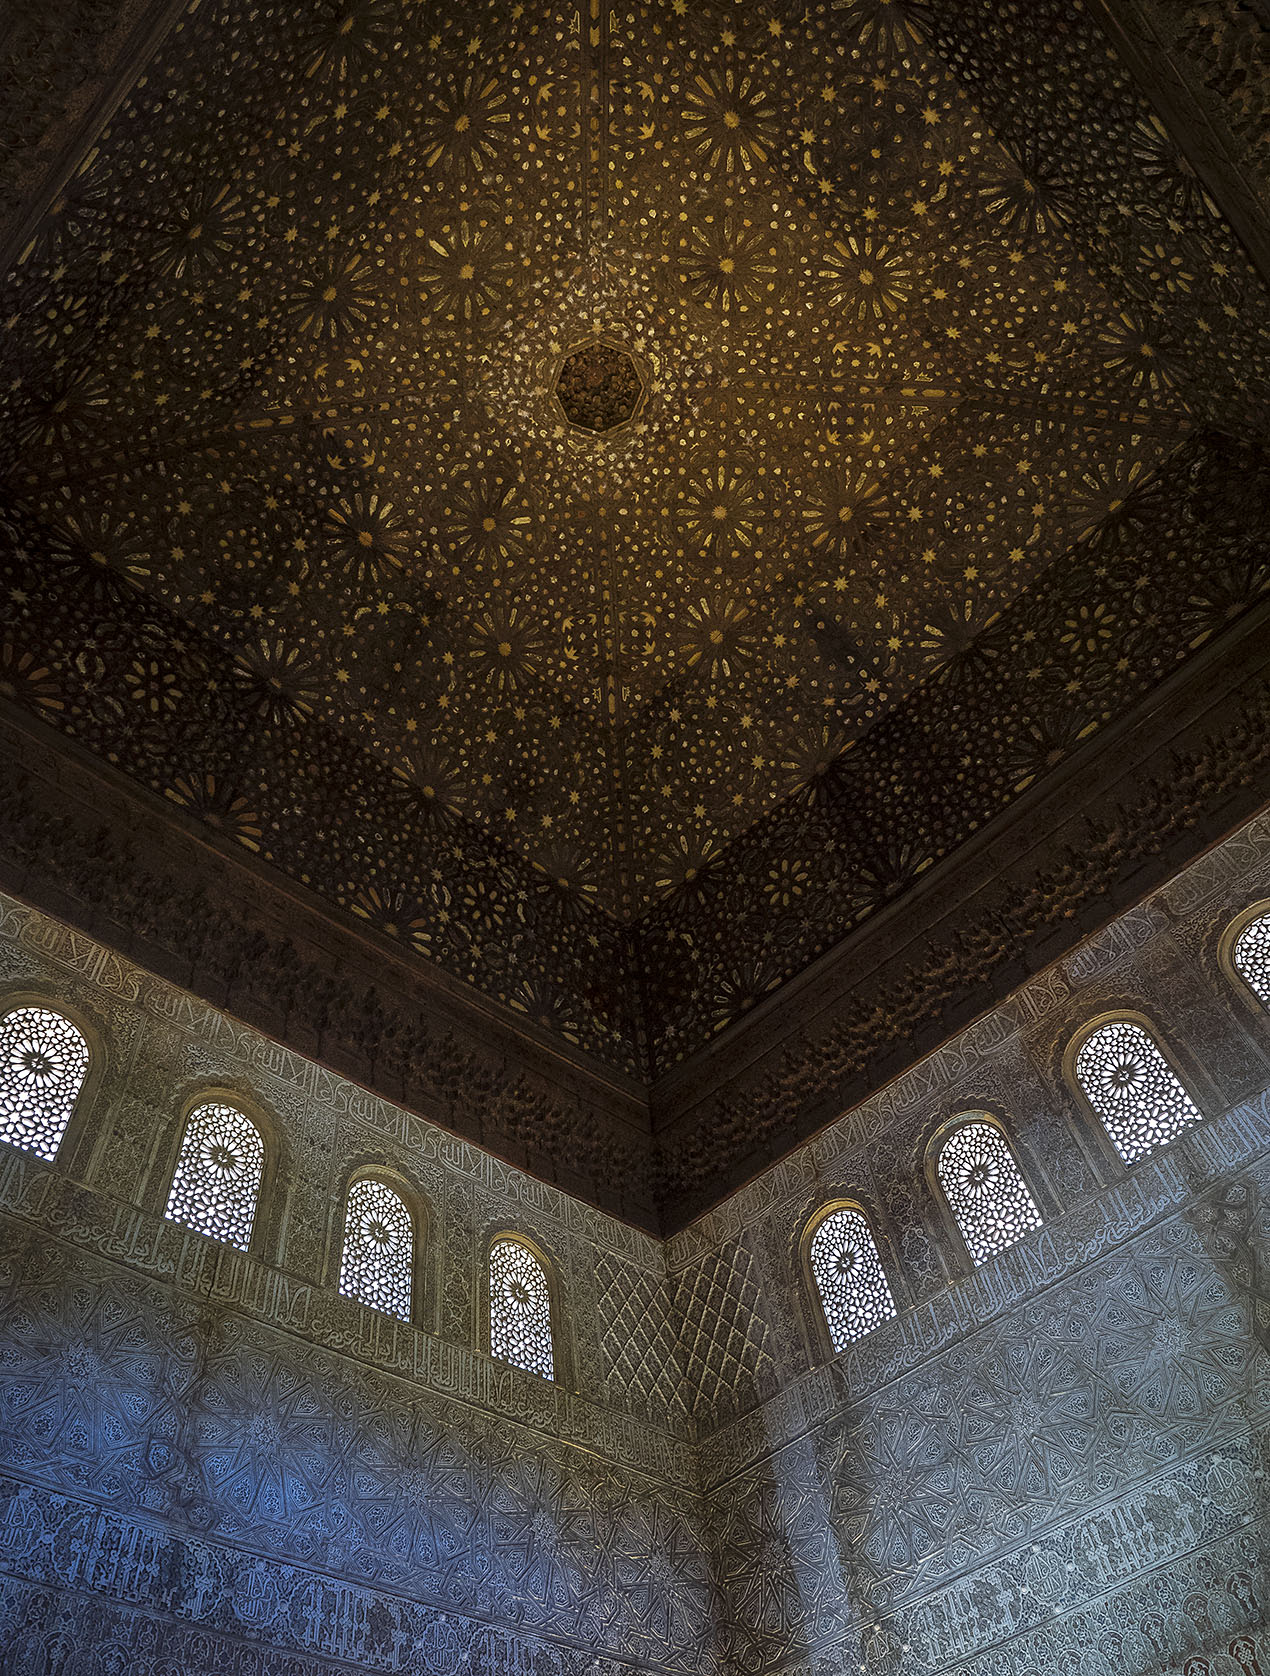 Andalusia - Alhambra interior